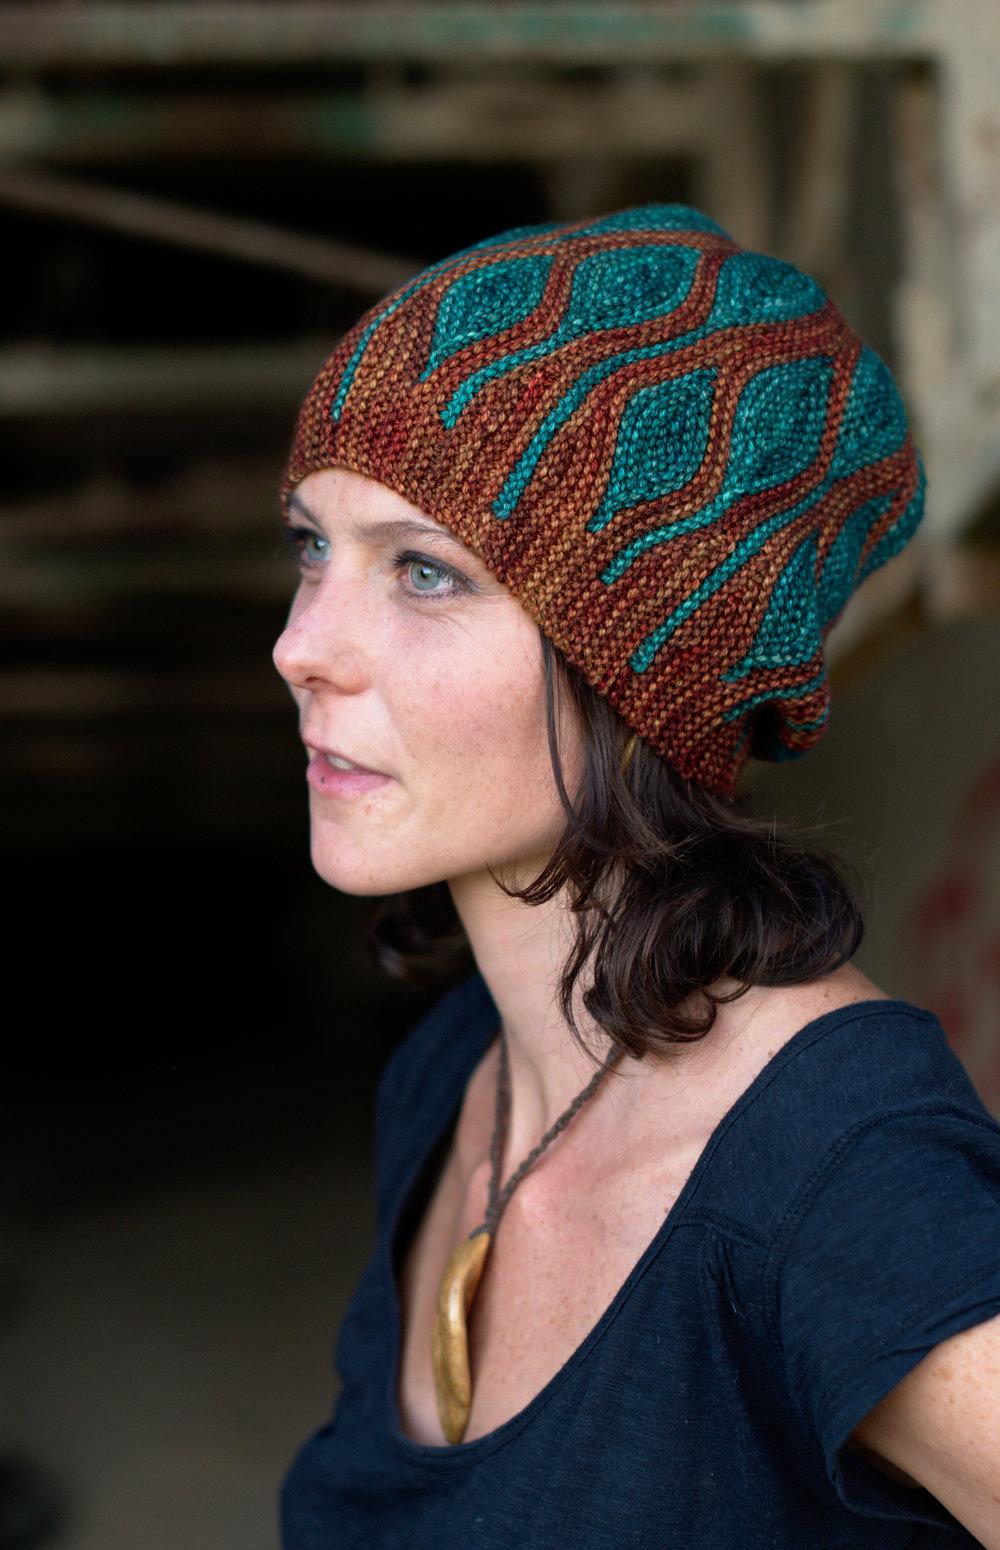 Toph sideways knit short row colourwork Hat knitting pattern